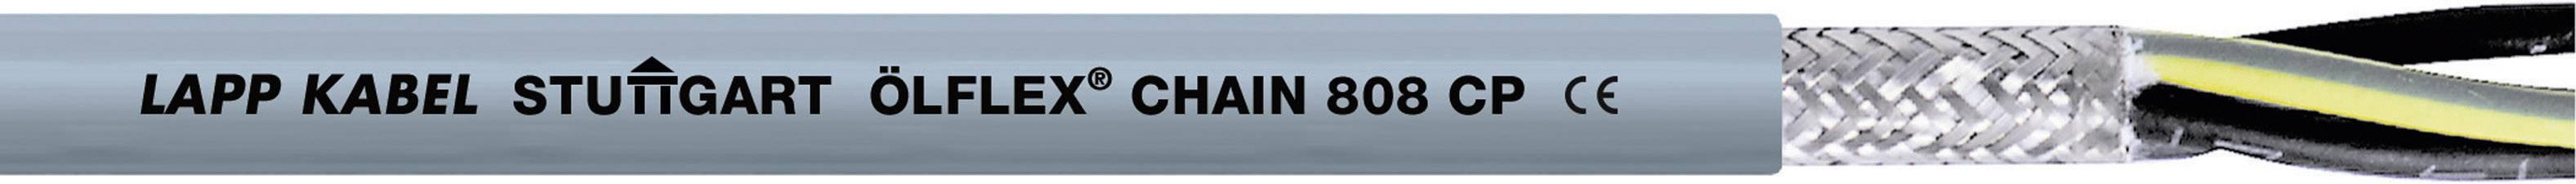 Žíla kabelu LappKabel ÖLFLEX CHAIN 808 CP 7G0,75 (1027763), 7x 0,75 mm², polyurethan, Ø 9,1 mm, stíněný, 50 m,